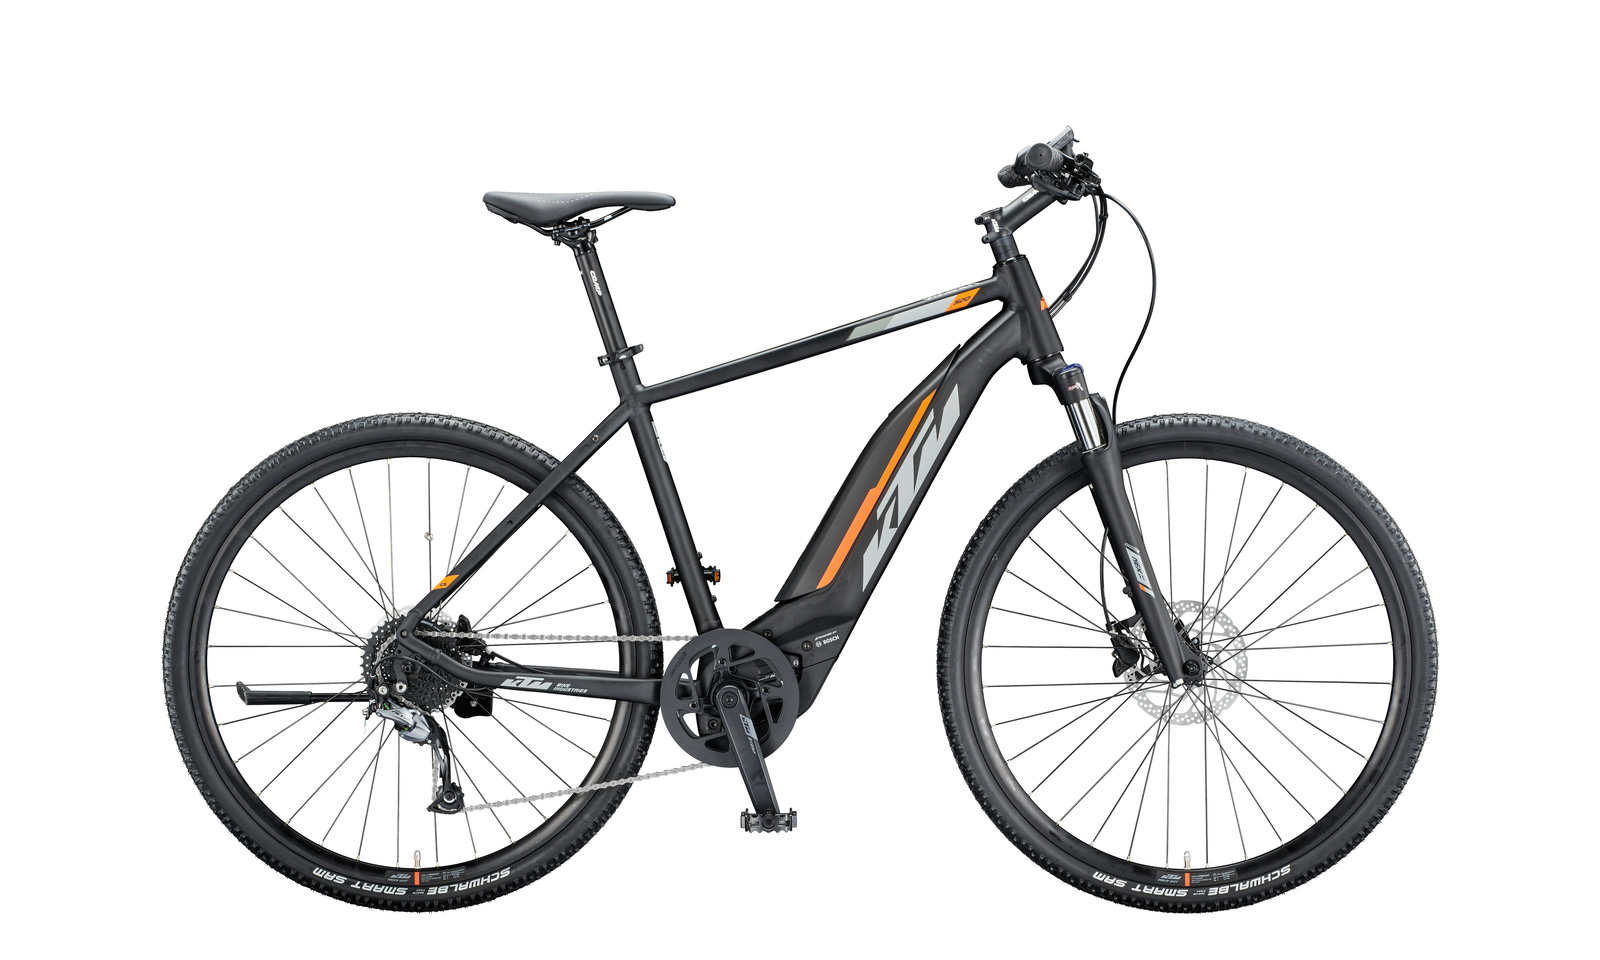 Biciclete electrice KTM E-Offroad MACINA CROSS 520 1x9 Shimano Acera